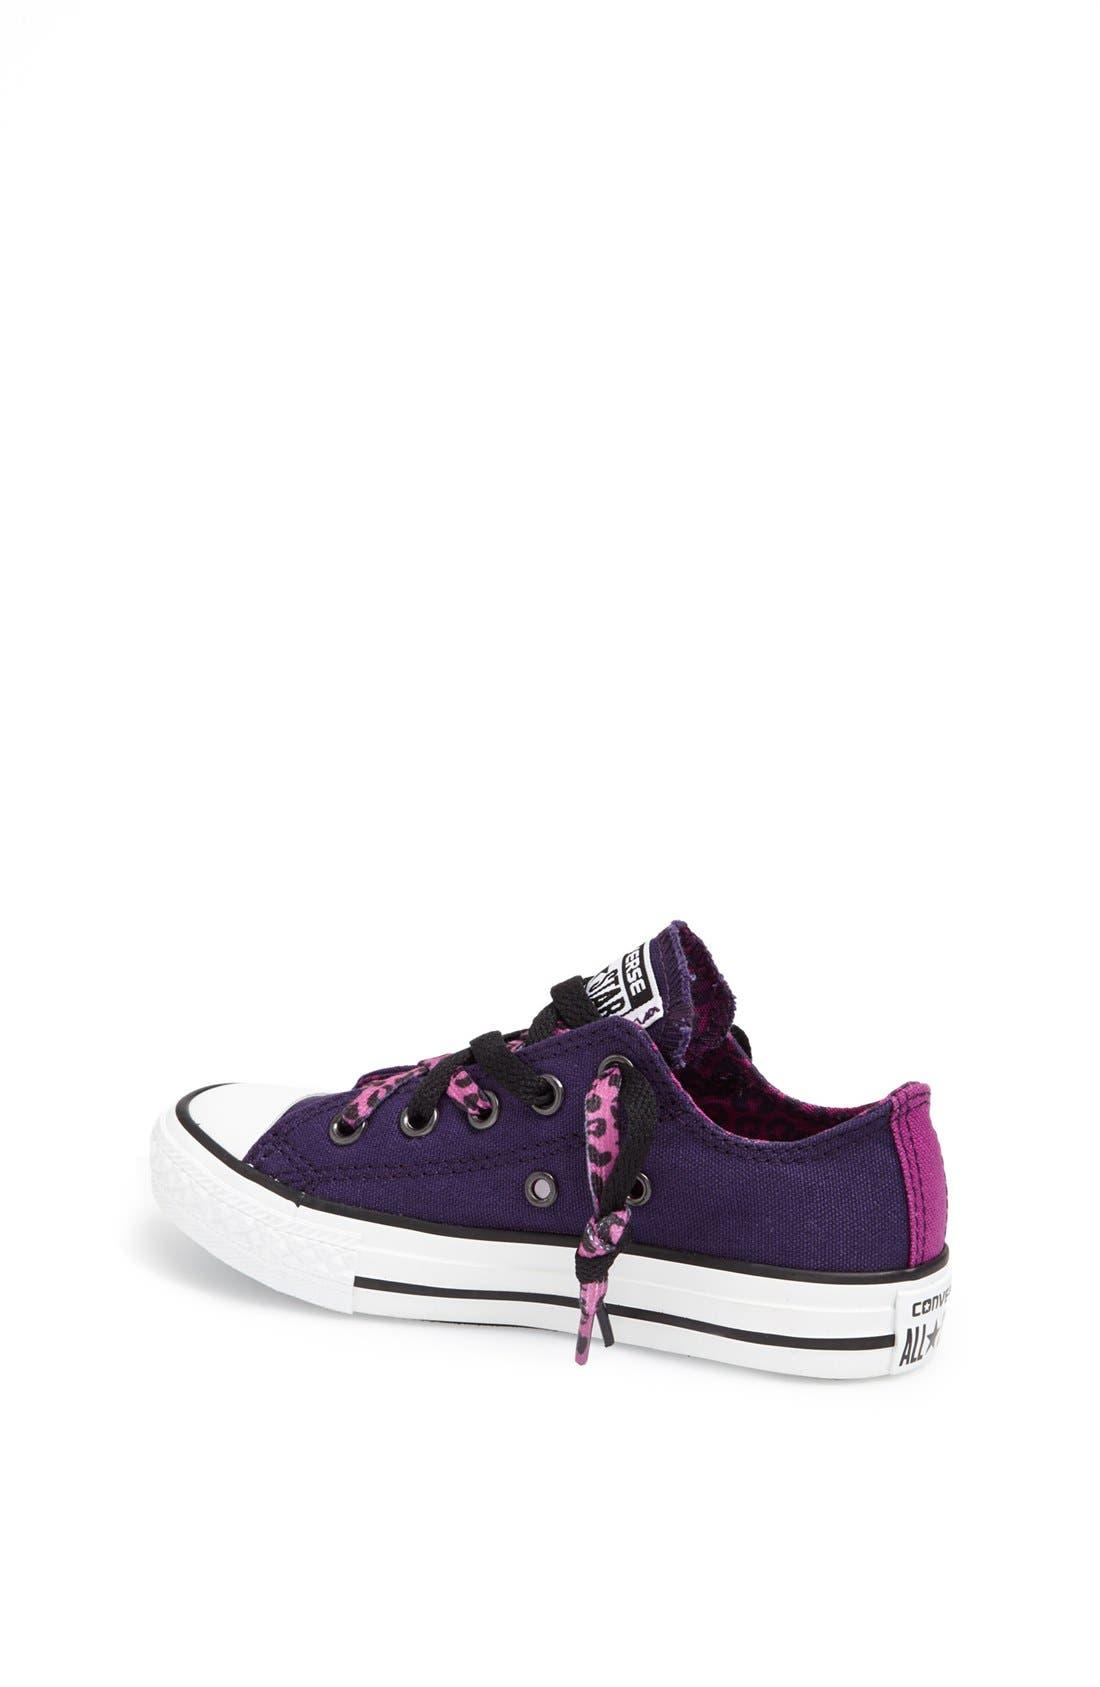 Alternate Image 2  - Converse Chuck Taylor® All Star® 'Kriss N Kross' Sneaker (Toddler, Little Kid & Big Kid)